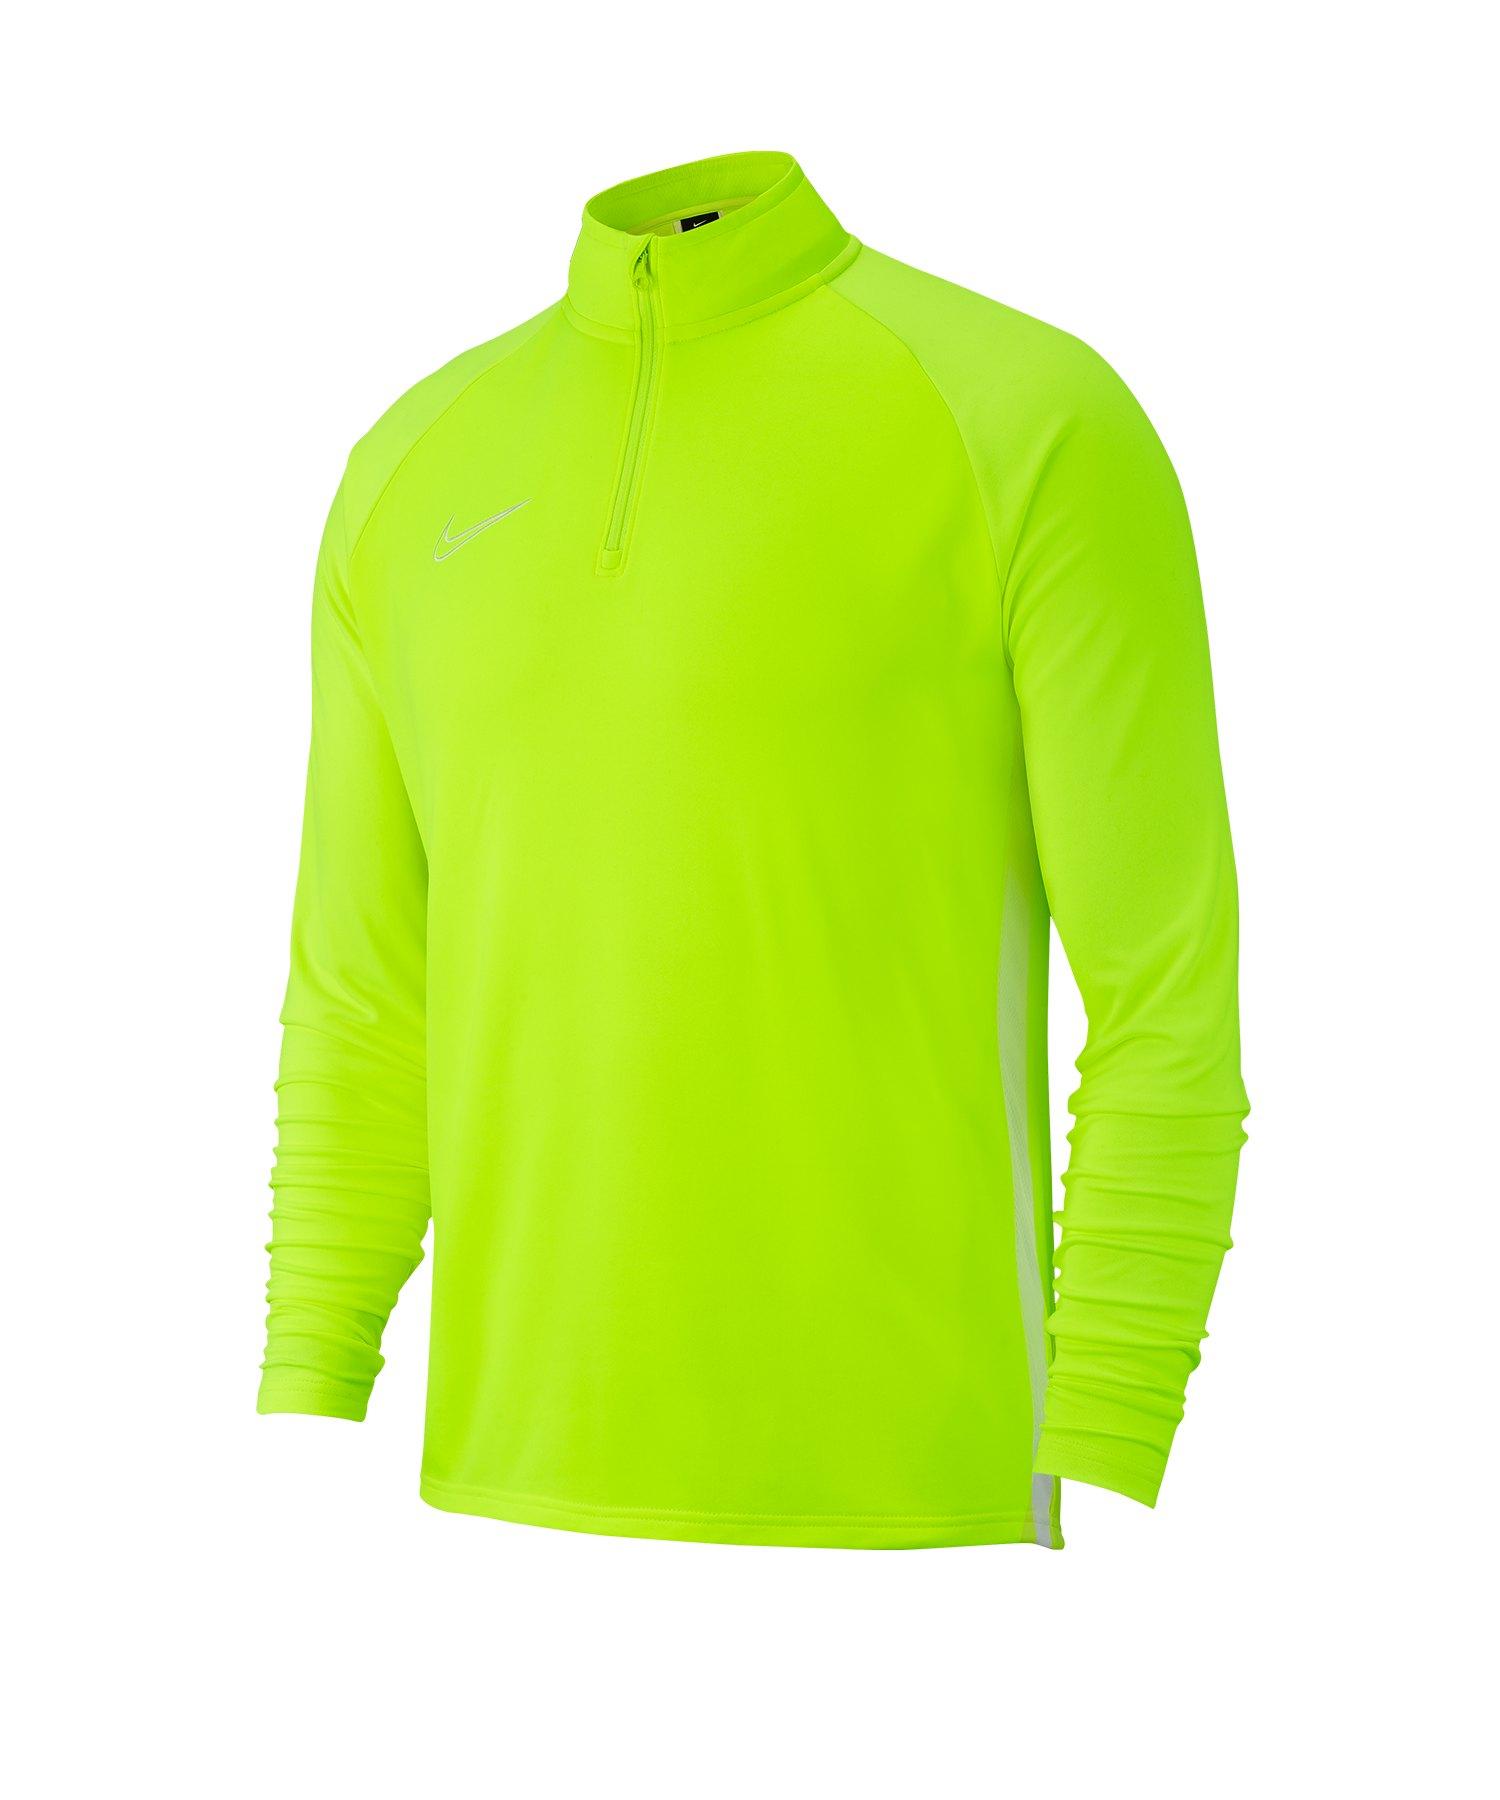 Nike Academy 19 1/4 Zip Drill Top Gelb F702 - gelb